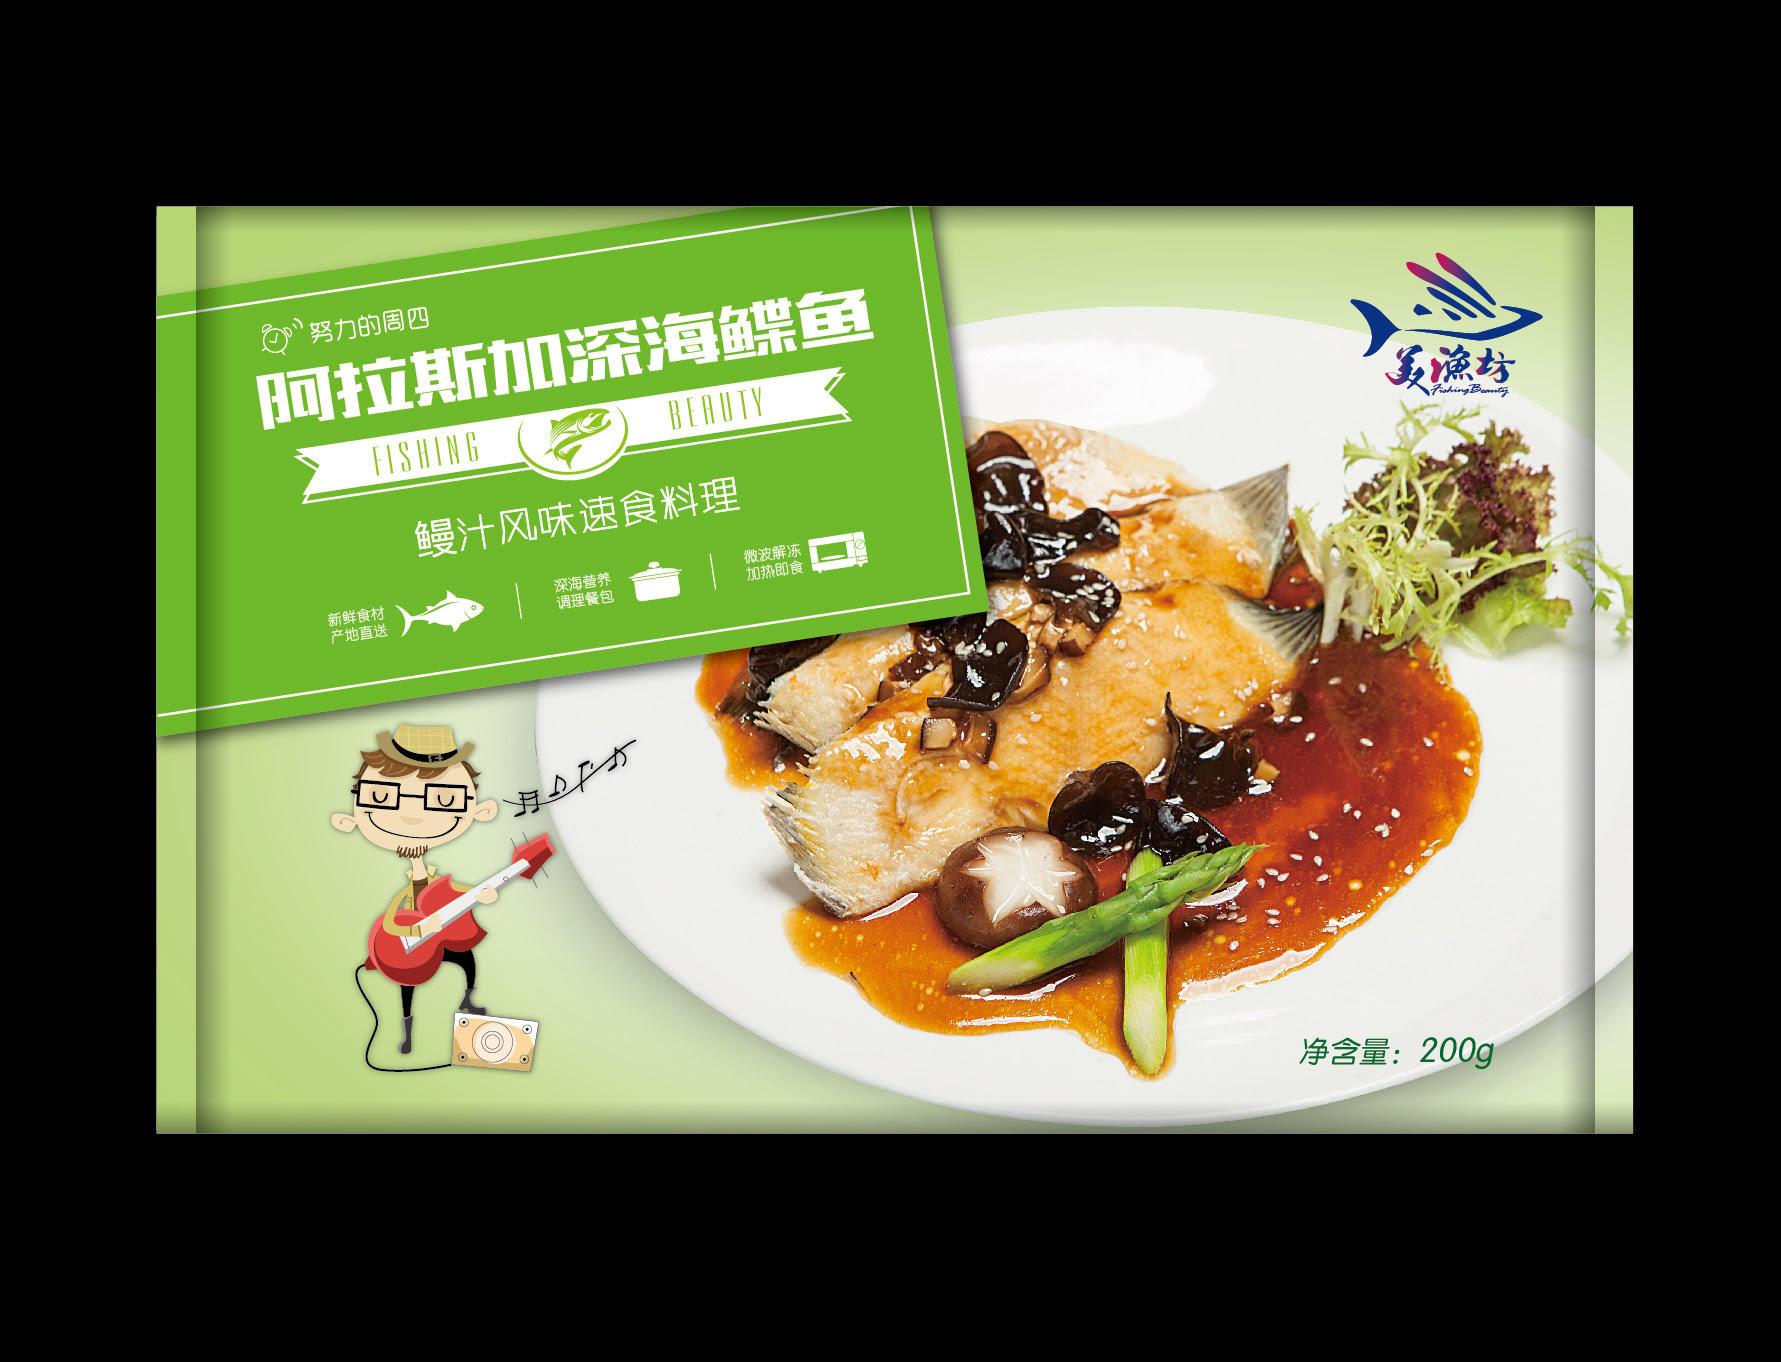 Dalian Meihe Foodstuff